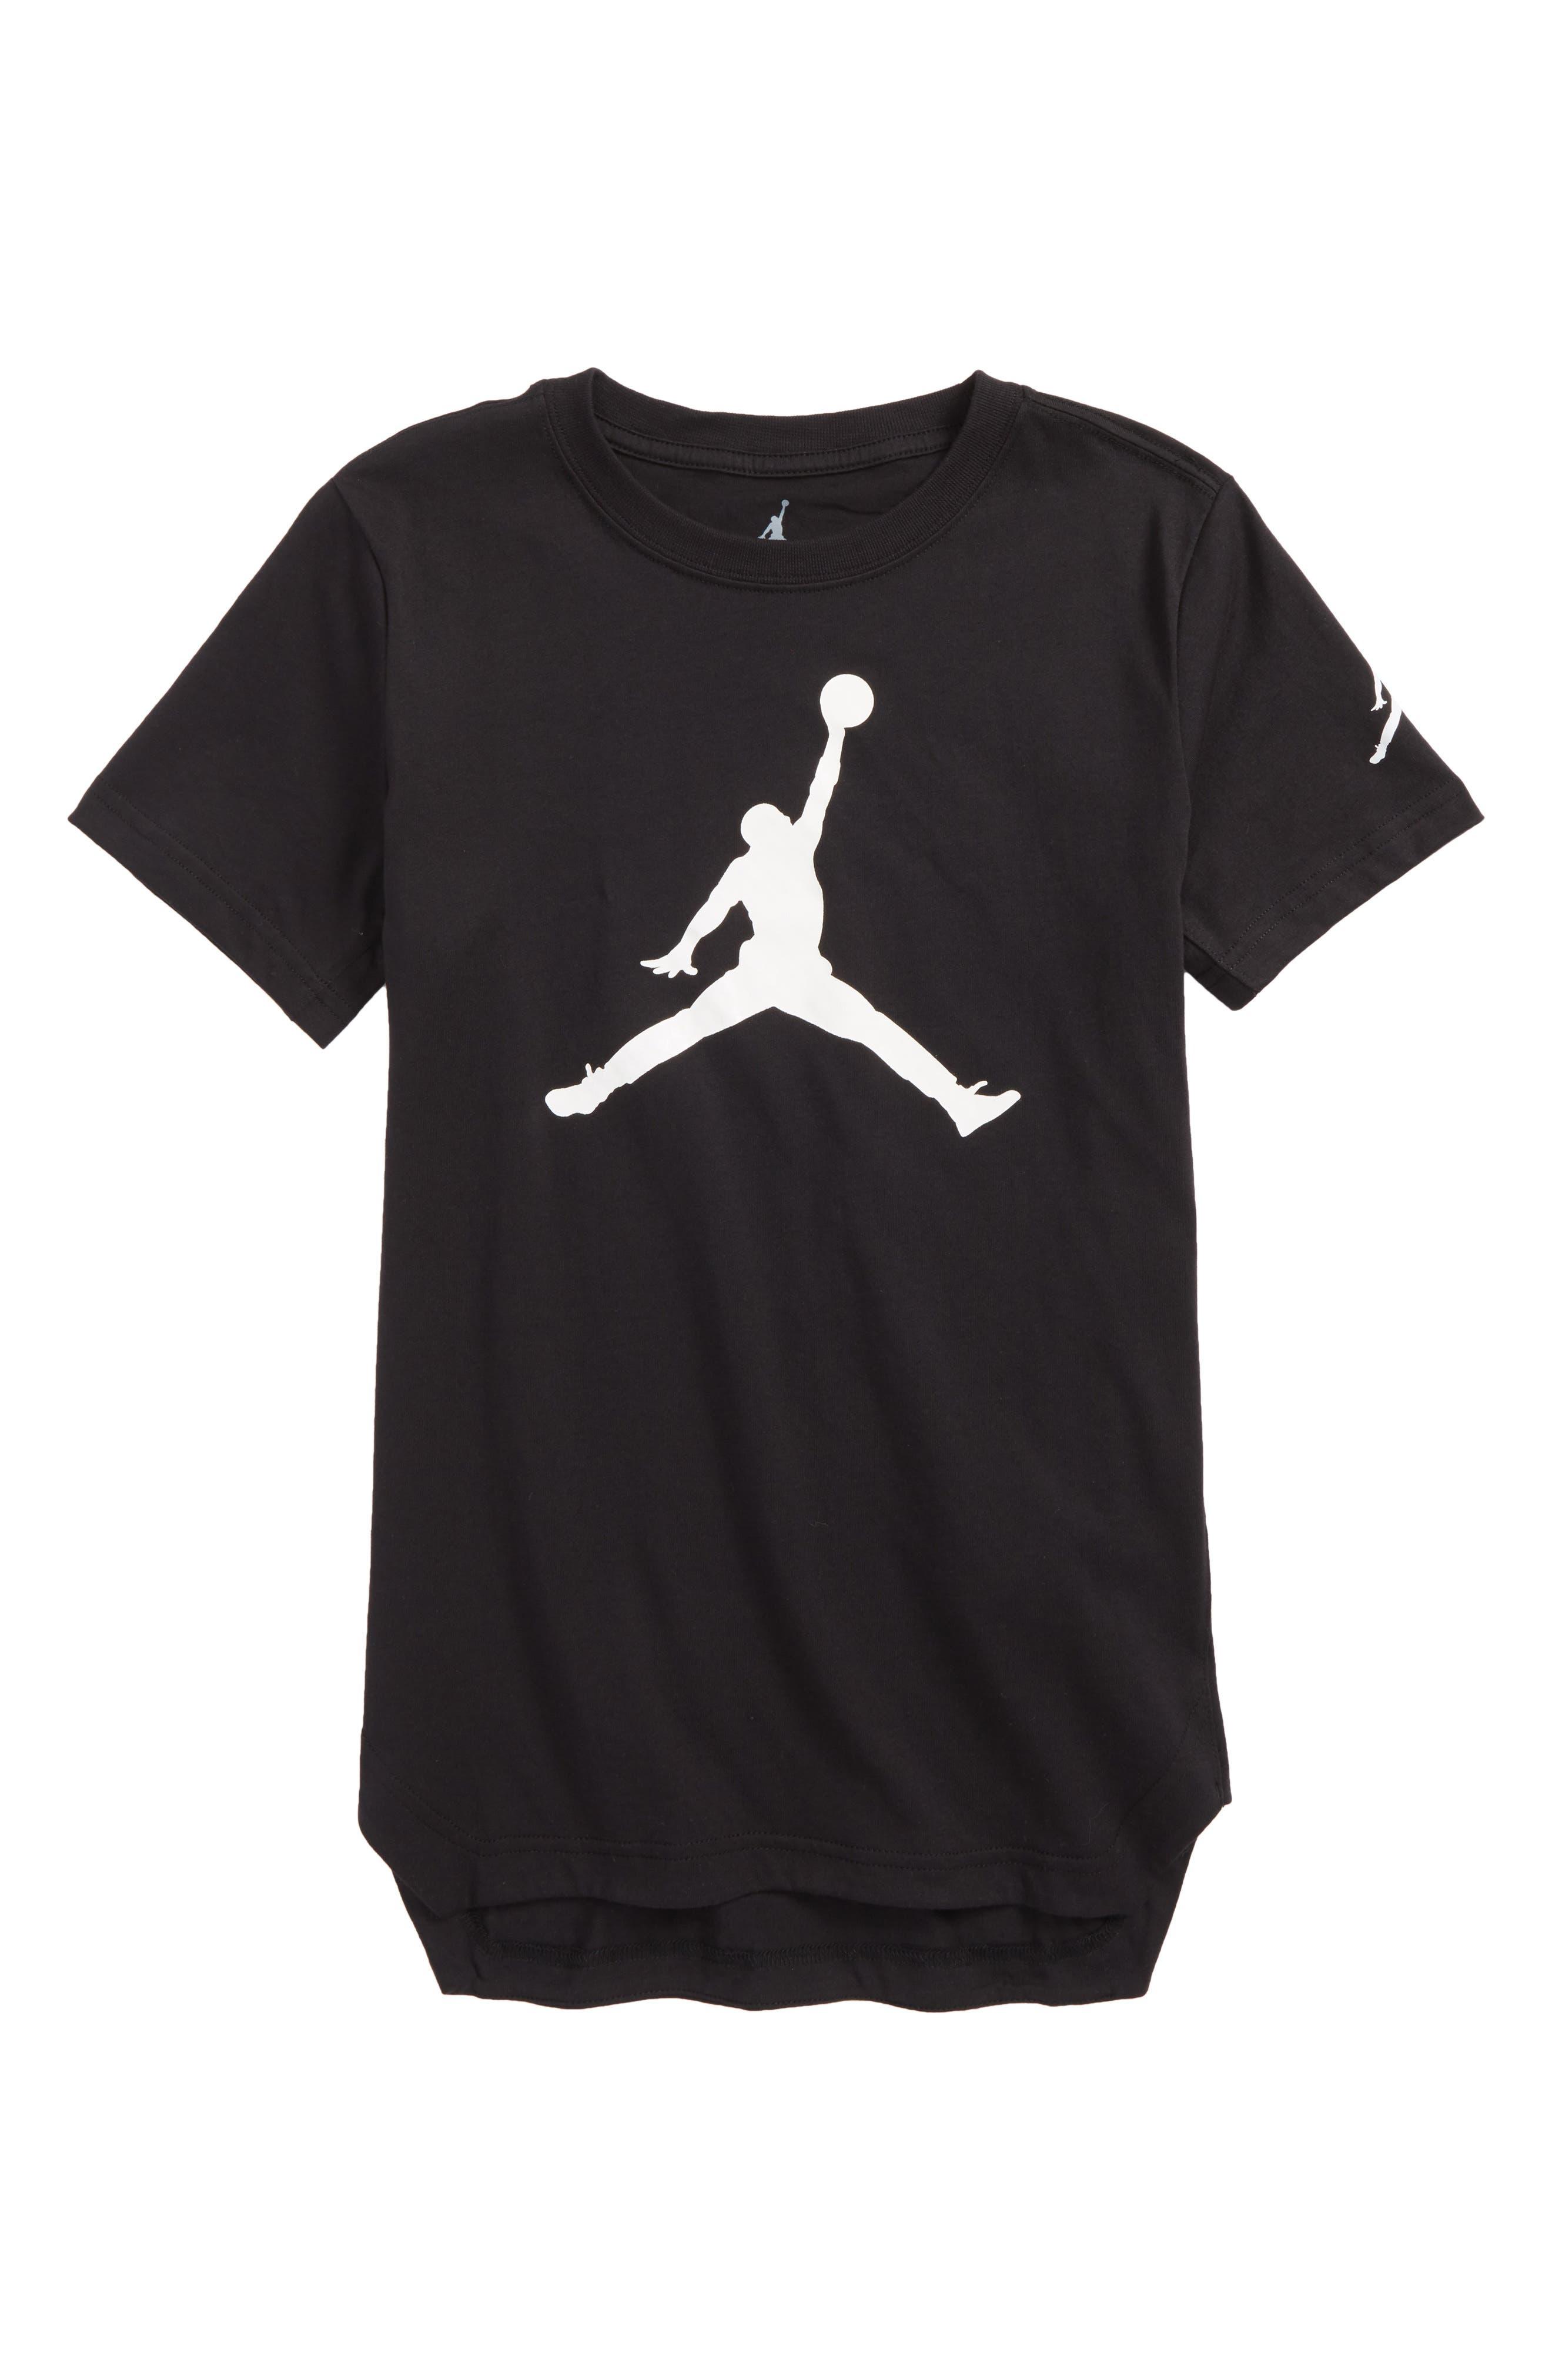 Jordan Jumpman Brand T-Shirt,                         Main,                         color, 004